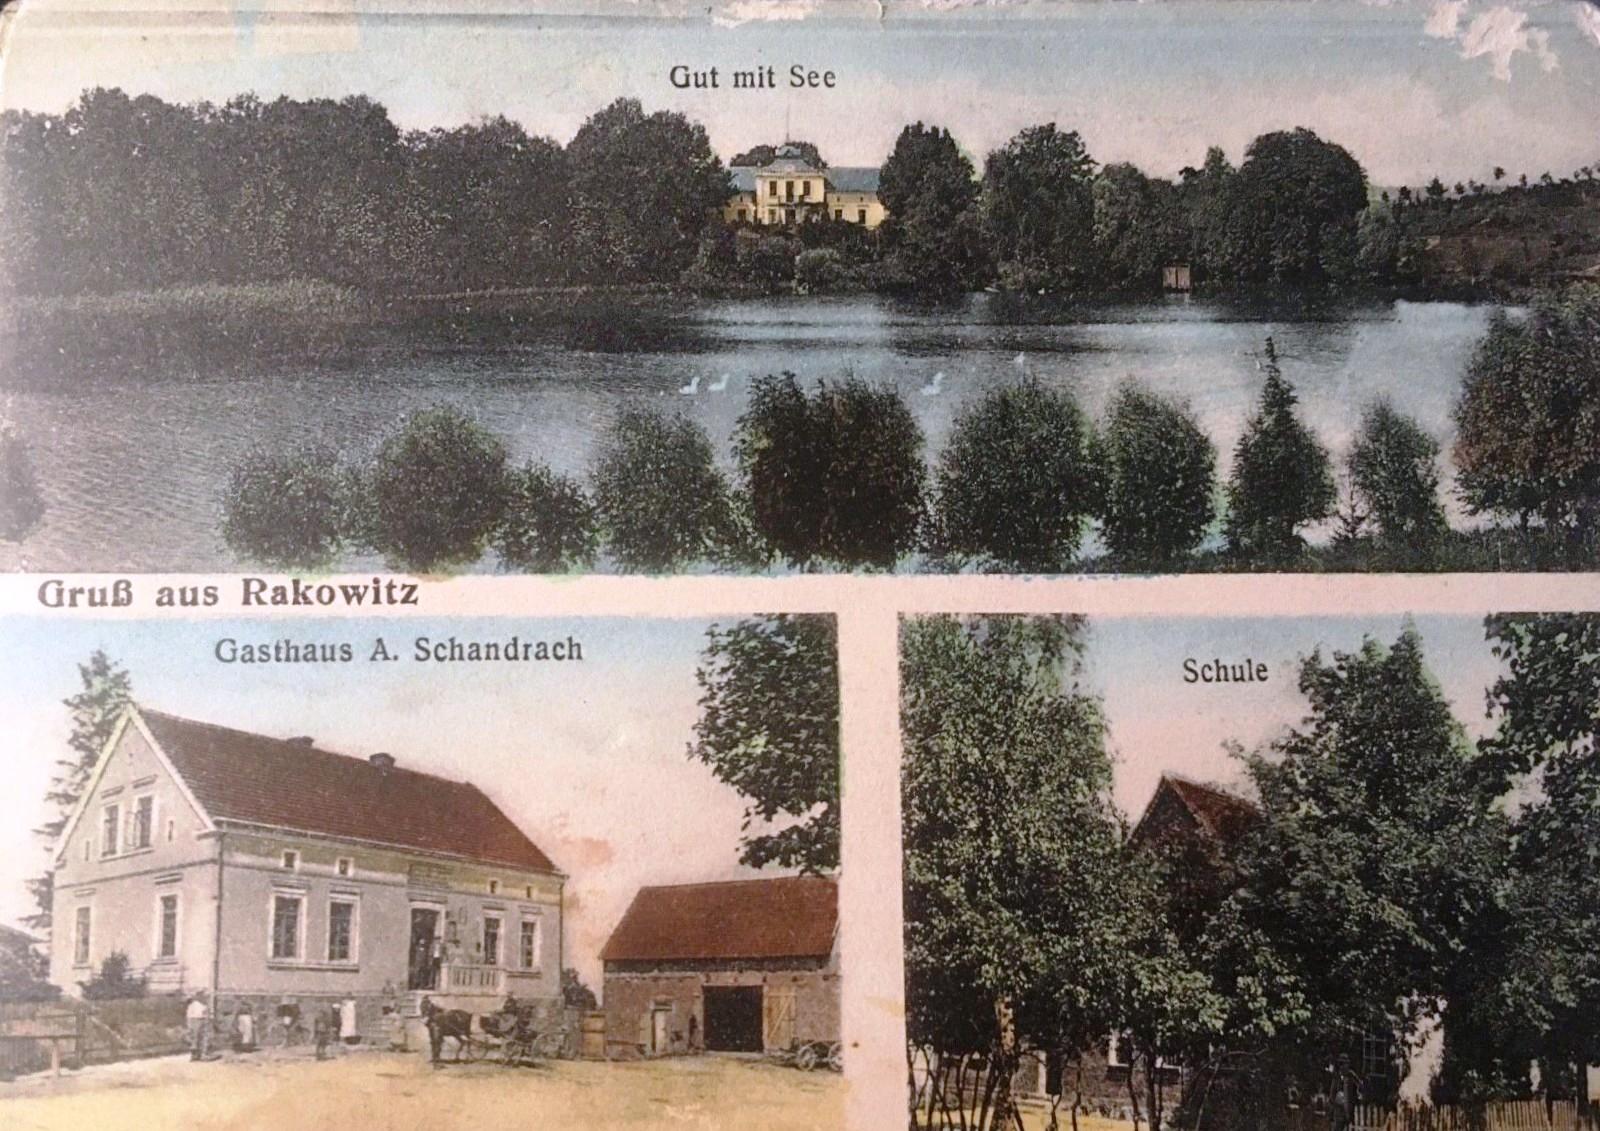 Sadlinki - Online Czat i Randki | Sadlinki, Polska - Poznaj